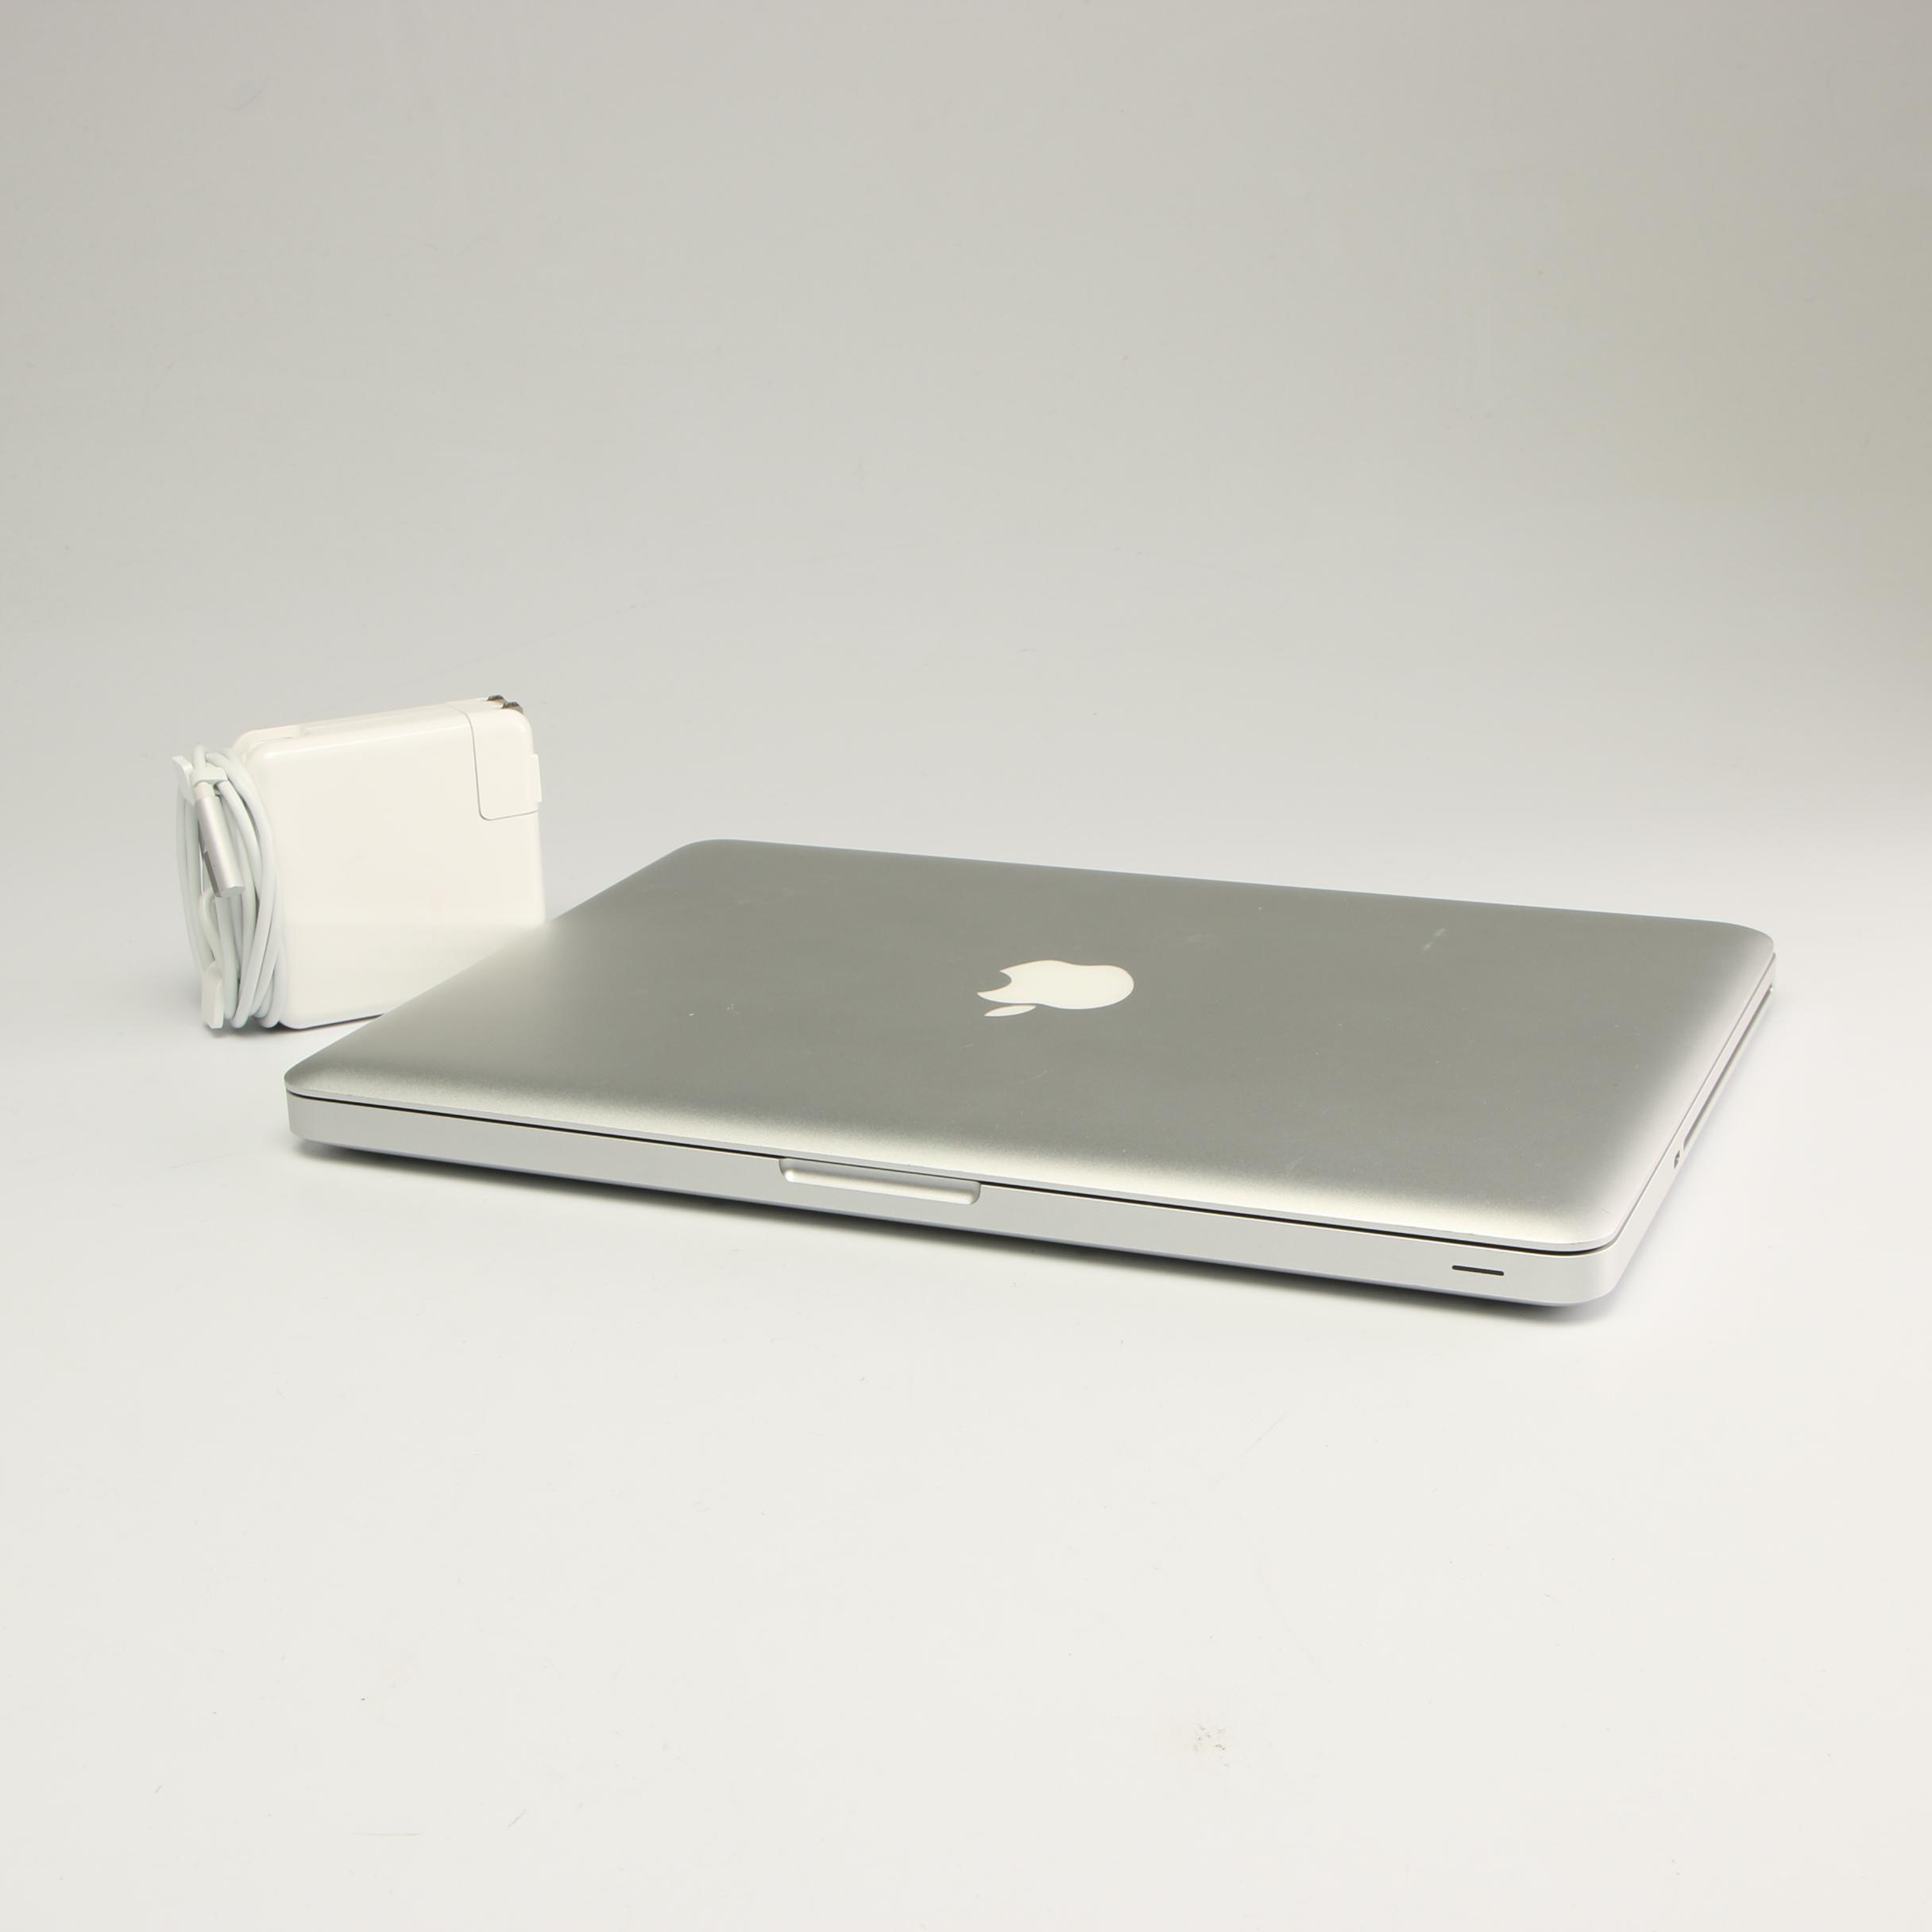 "13"" Apple MacBook Pro Laptop"